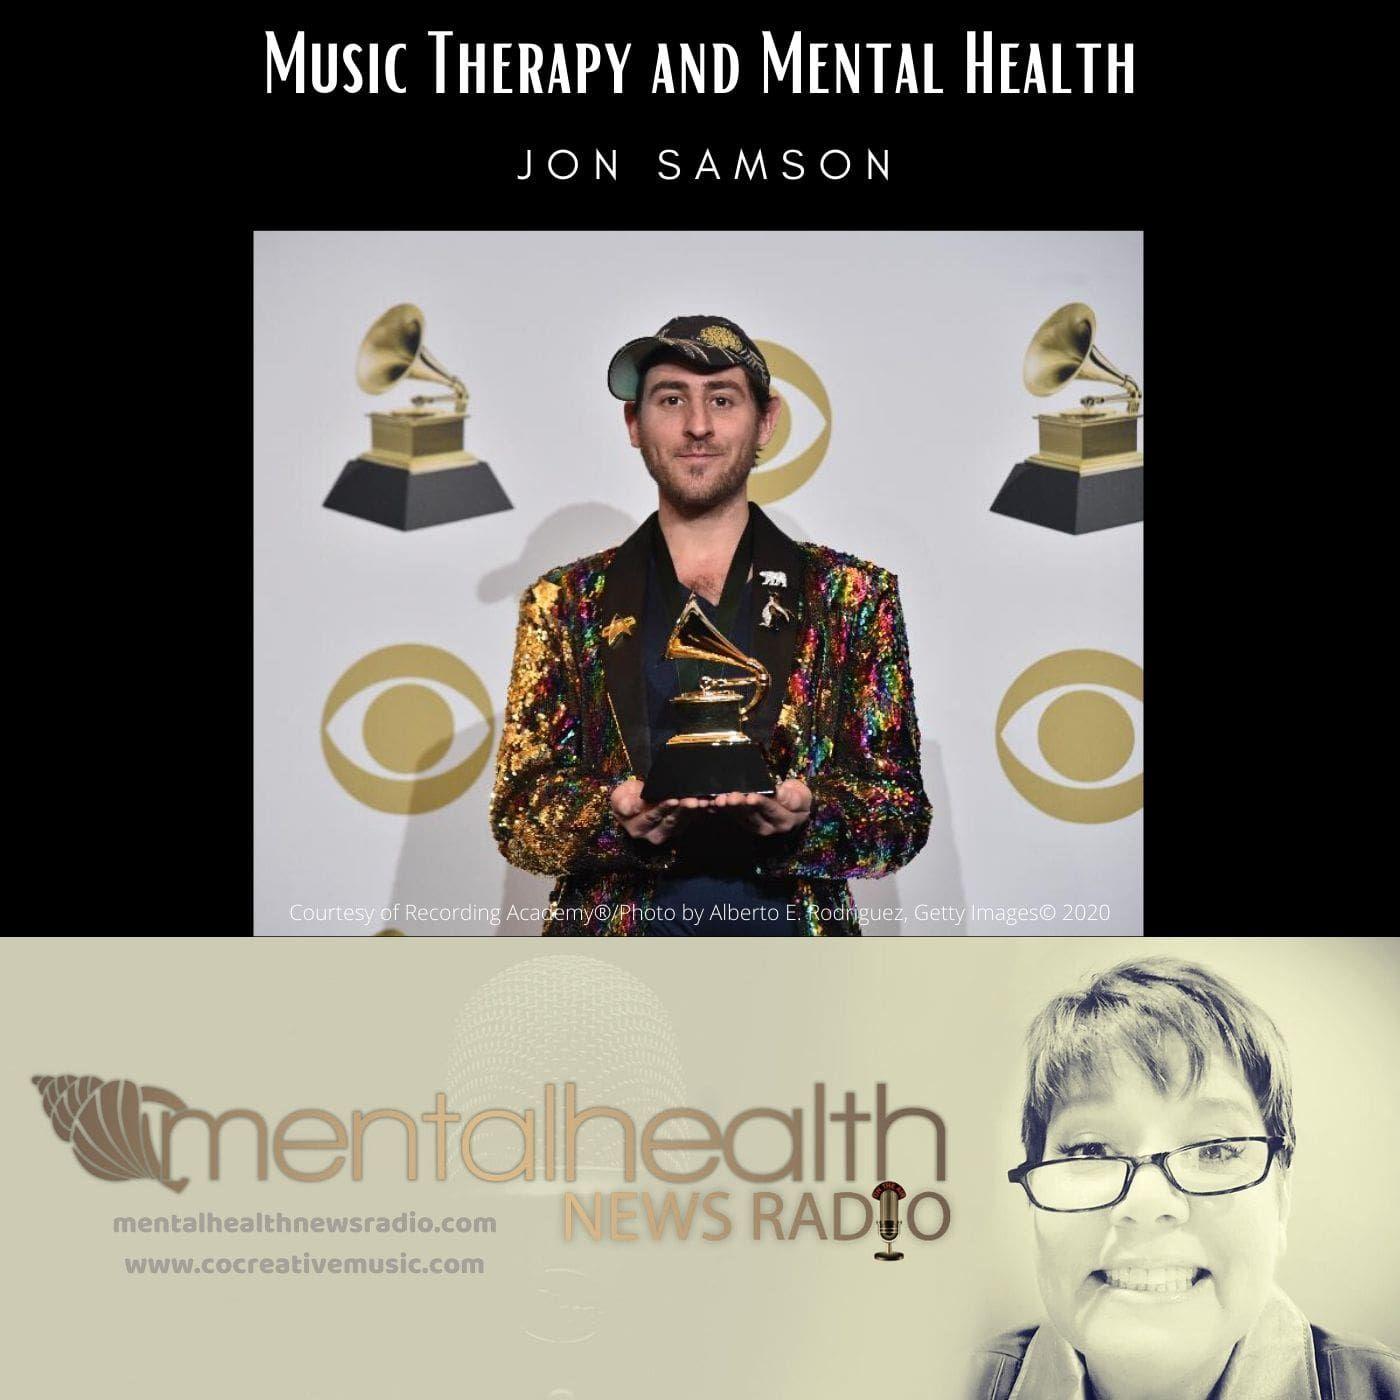 Mental Health News Radio - Music Therapy and Mental Health with Jon Samson